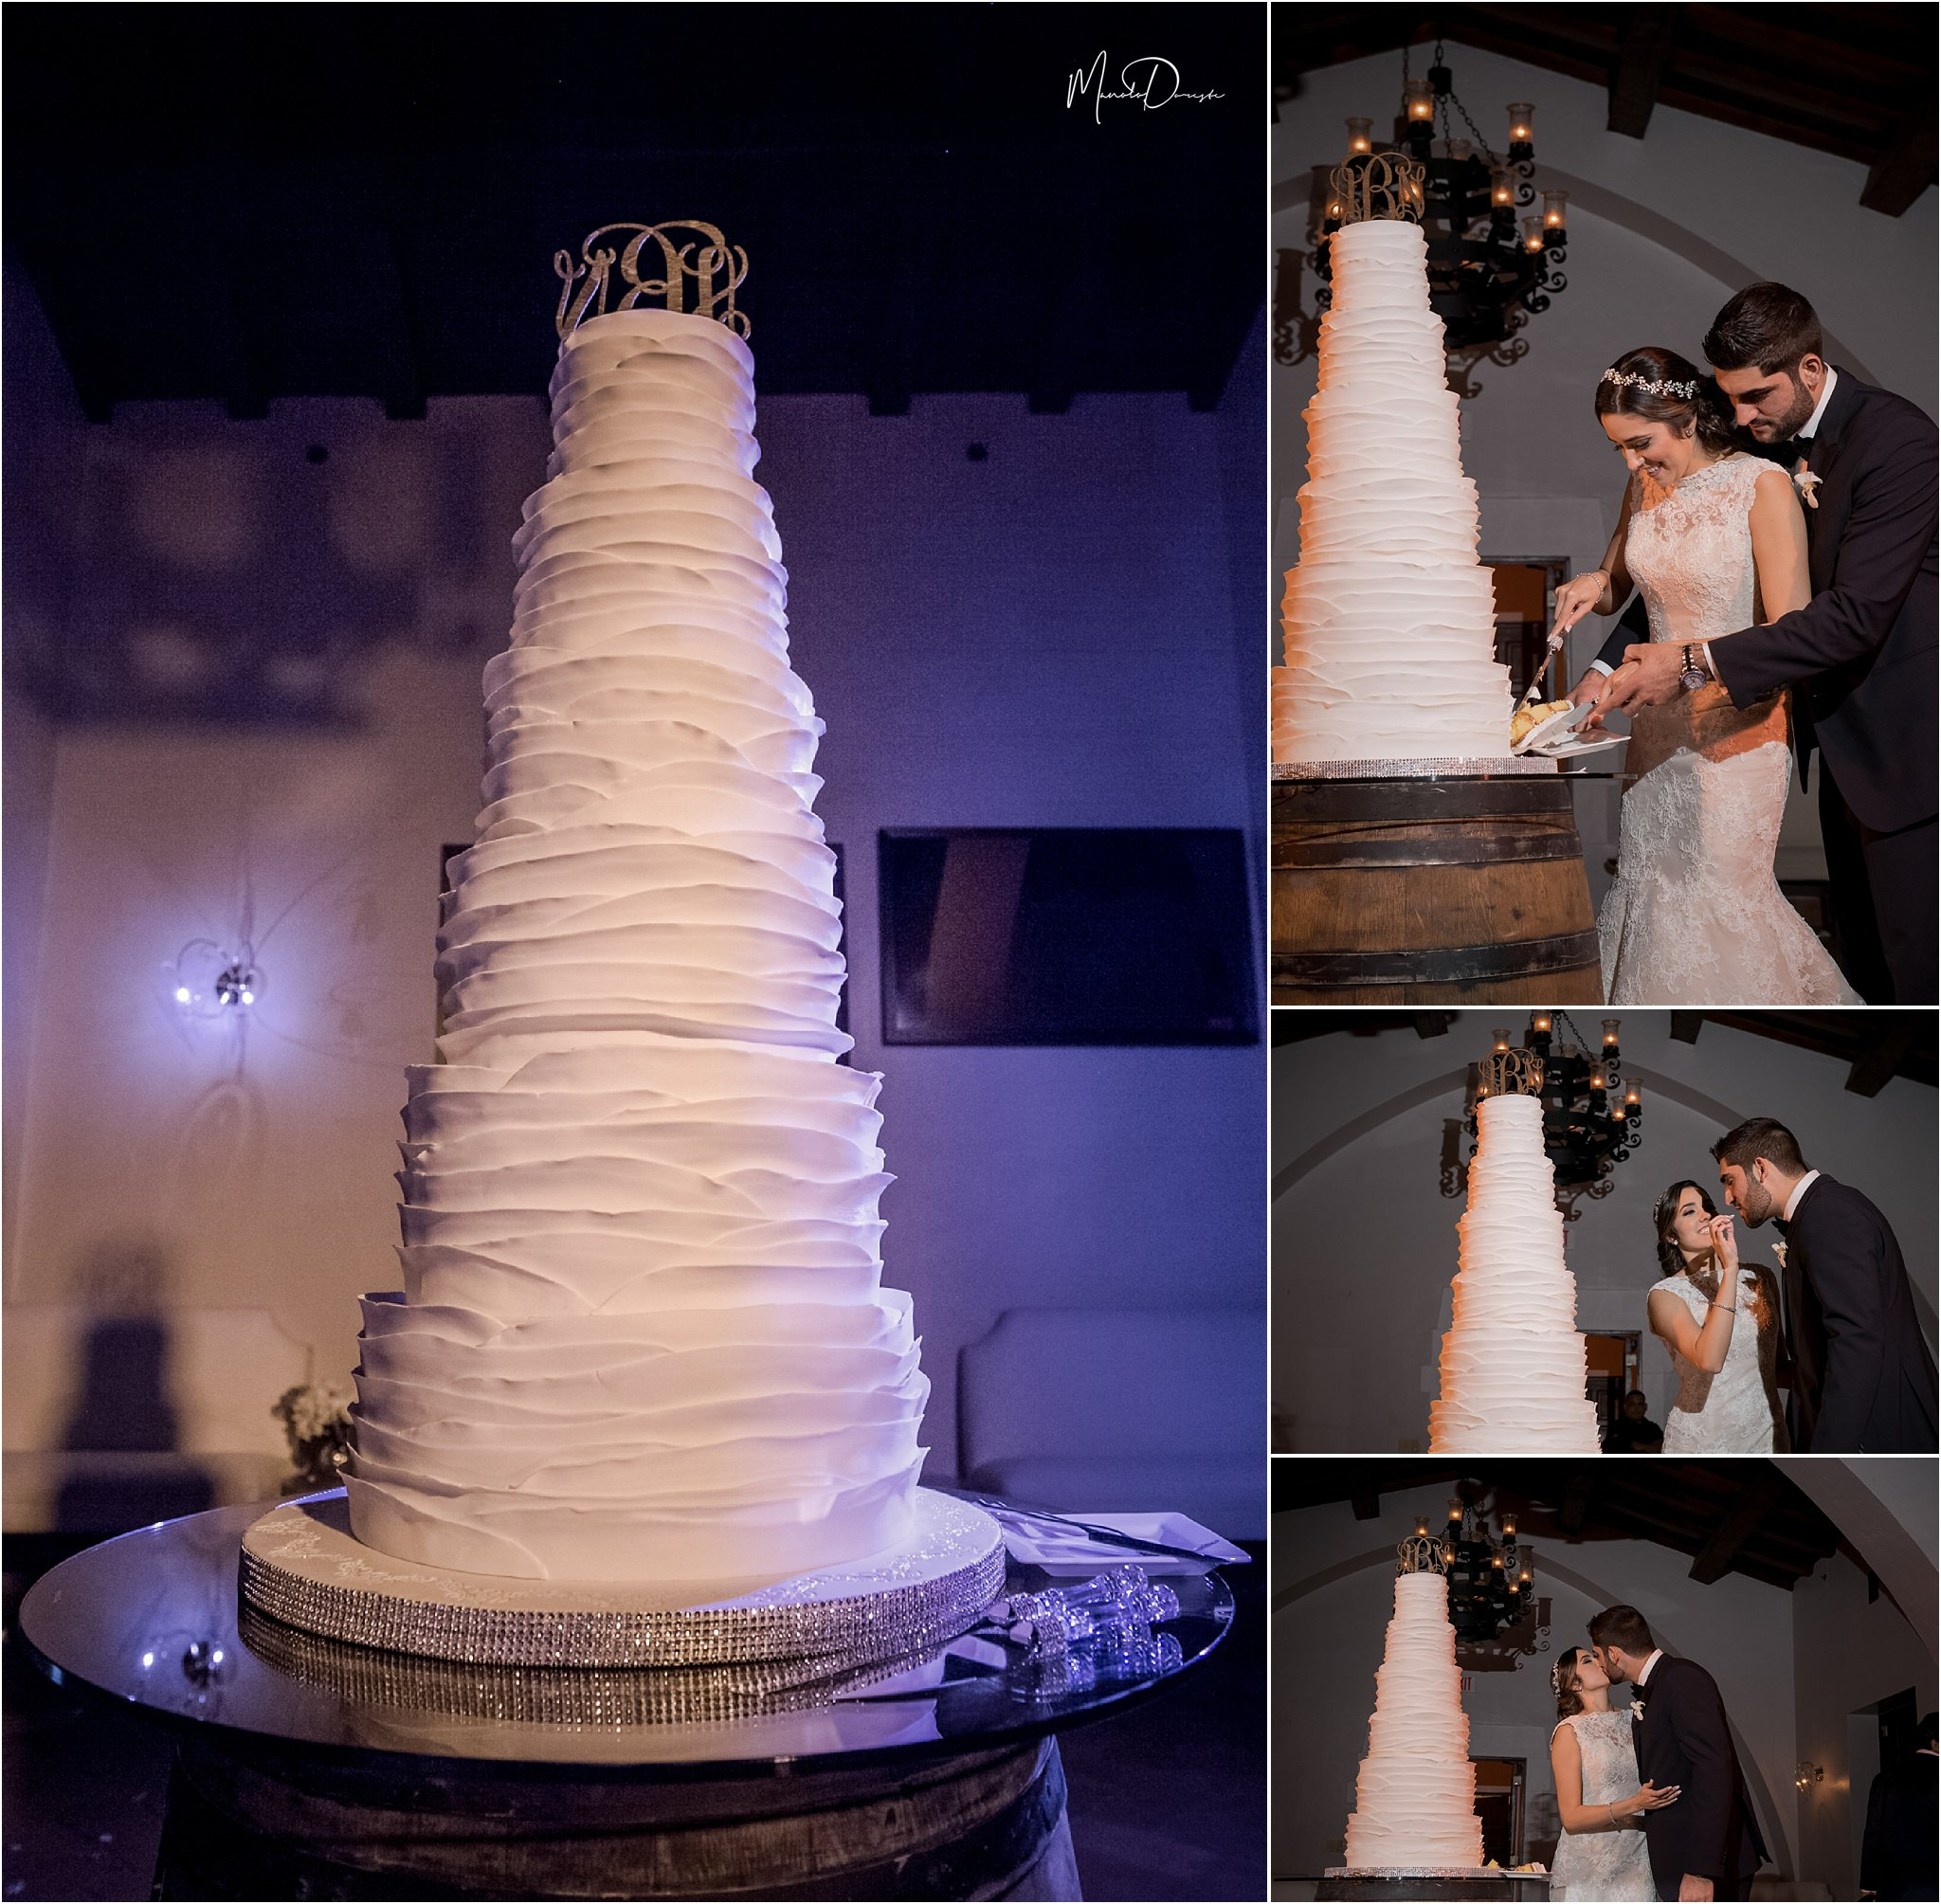 00945_ManoloDoreste_InFocusStudios_Wedding_Family_Photography_Miami_MiamiPhotographer.jpg